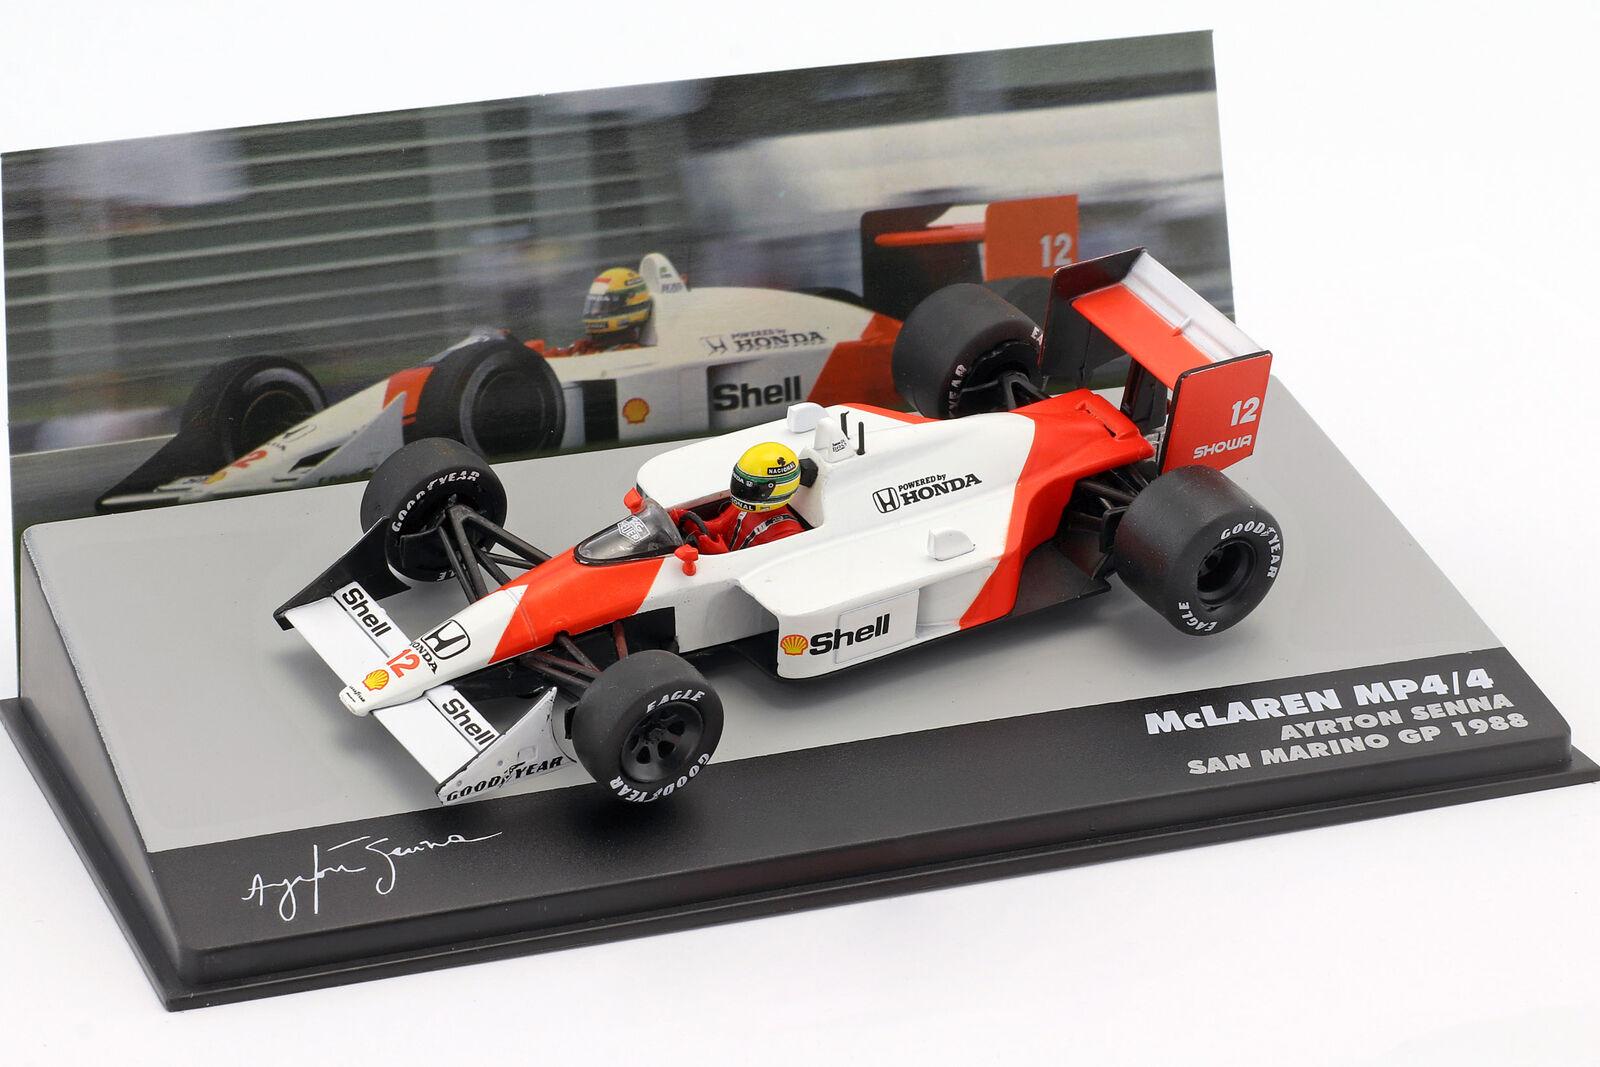 Senna Minichamps 1:43 547884212 1988 F1 McLaren Honda MP4//4 1st Win A